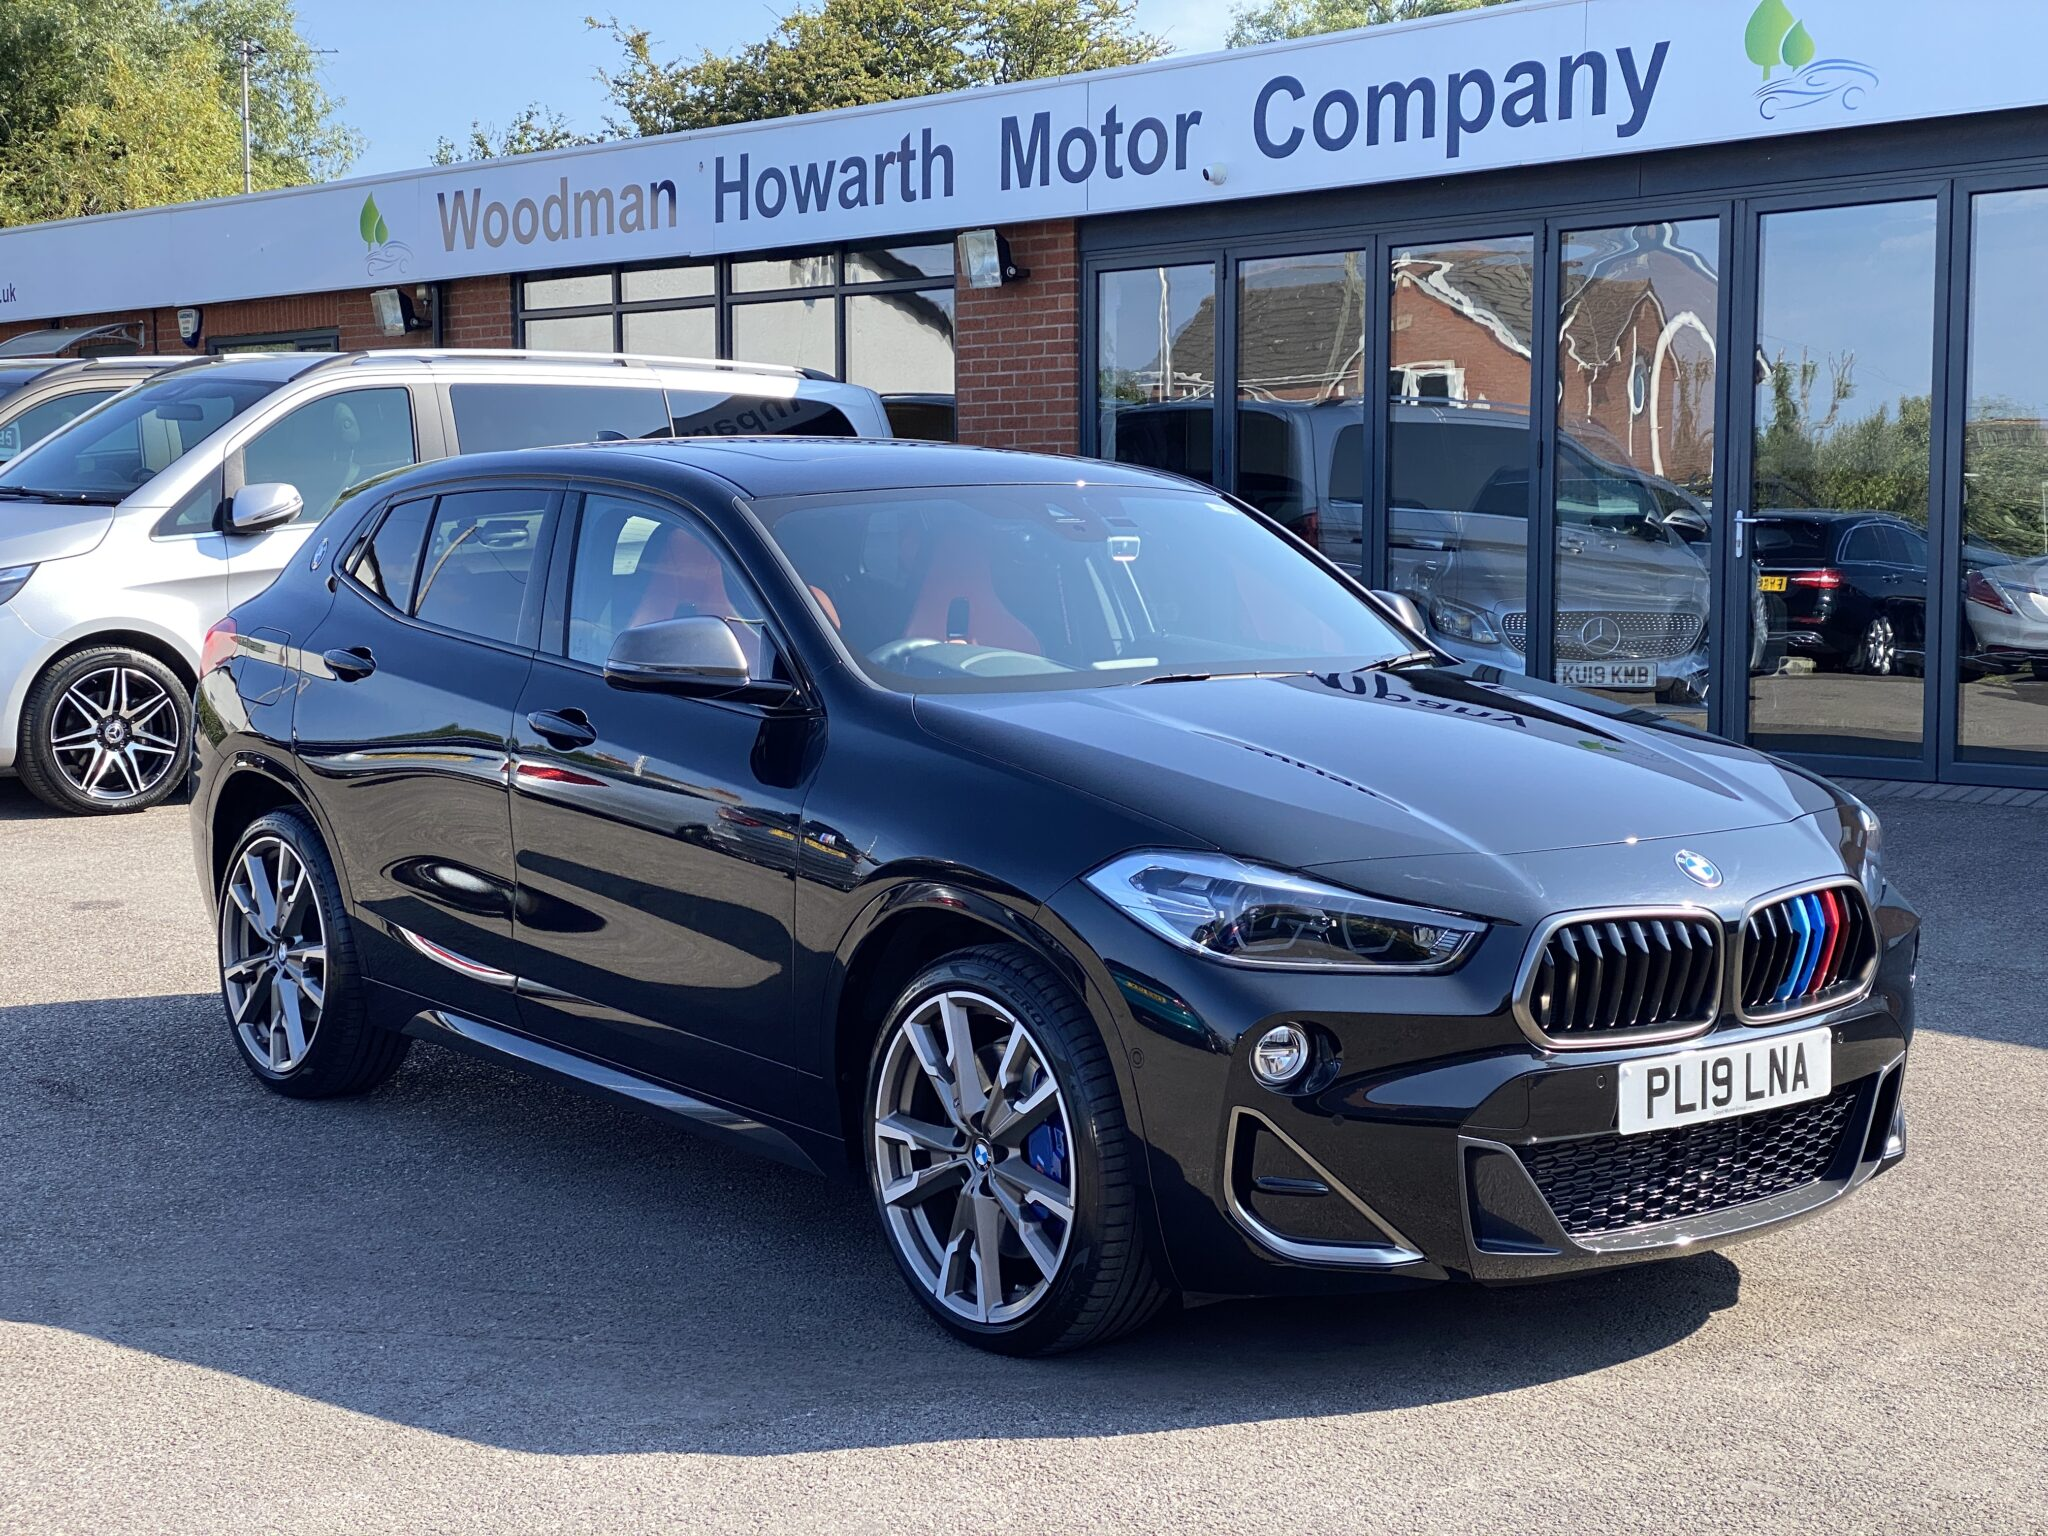 2019 19 BMW X2 M35i AUTO XDRIVE Panoramic Sunroof Reverse Cam FSH Stunning Car